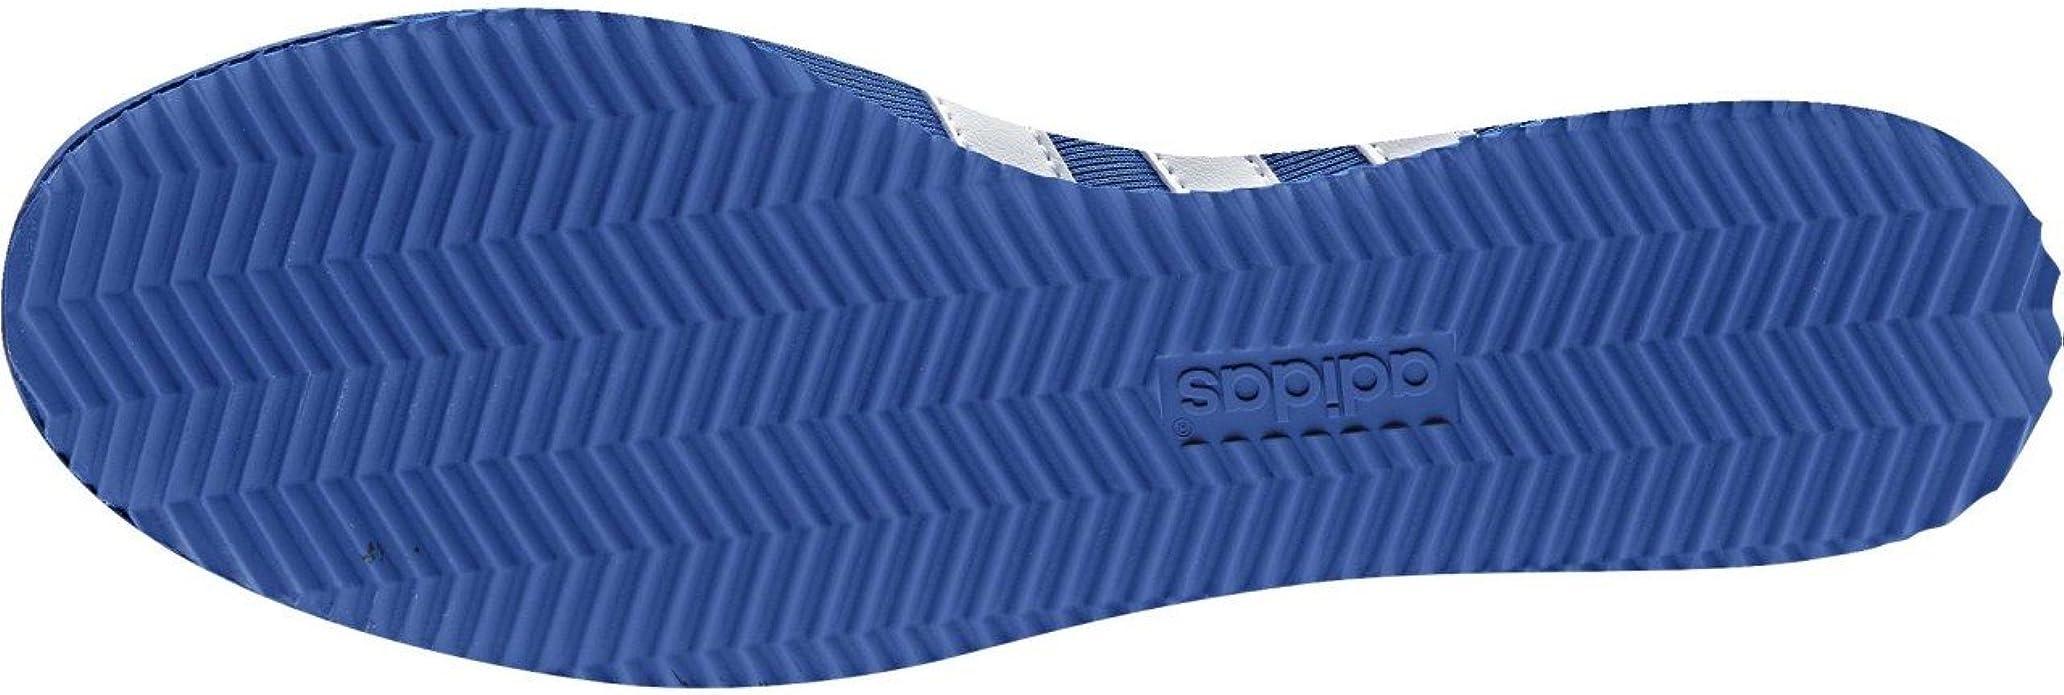 adidas neo t roc bleu